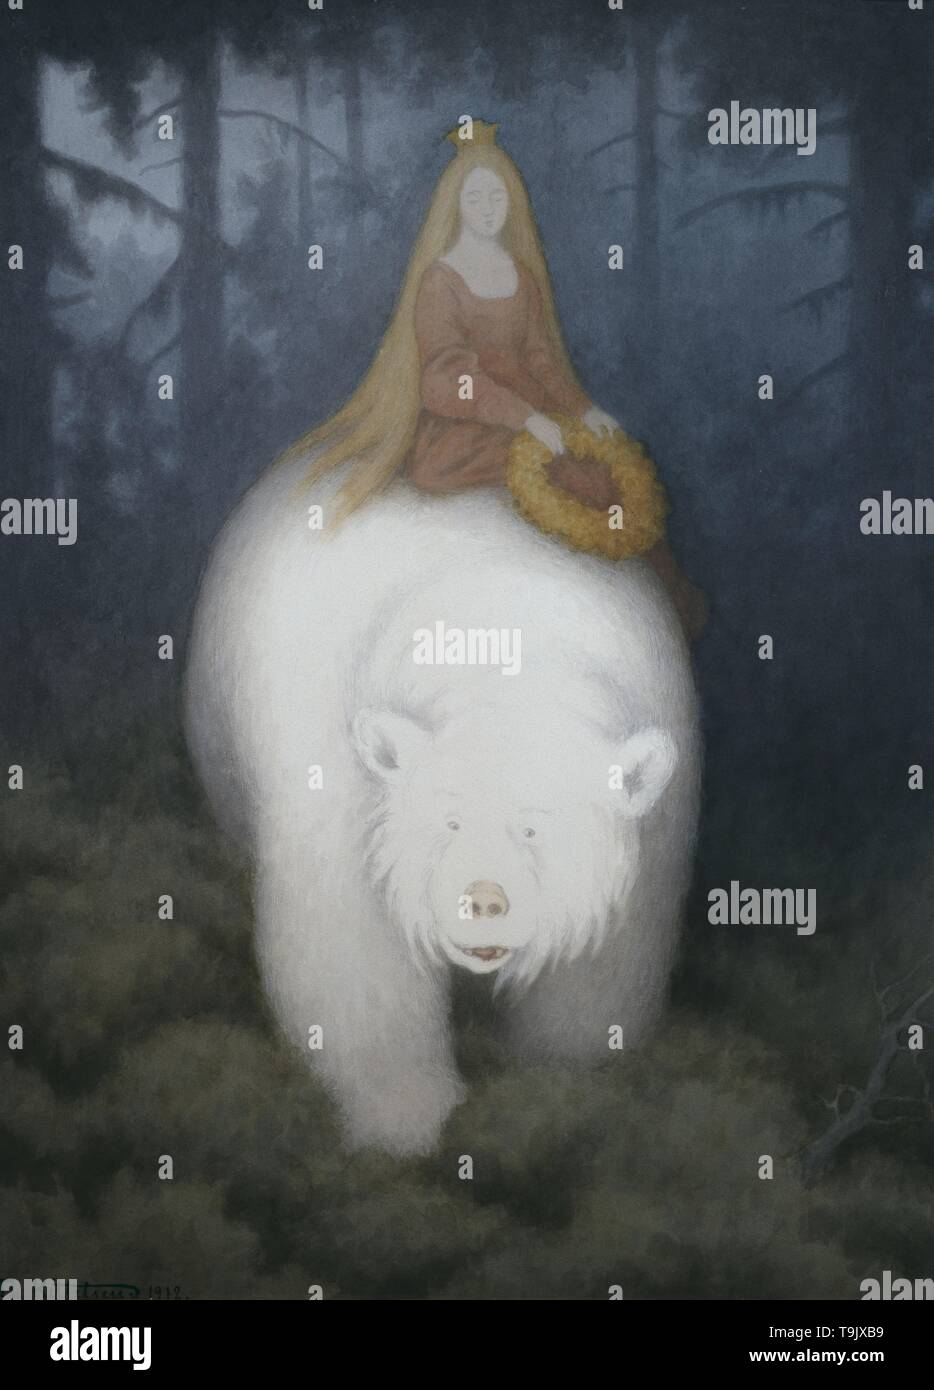 White-Bear-King-Valemon. Museum: PRIVATE COLLECTION. Author: THEODOR KITTELSEN. - Stock Image